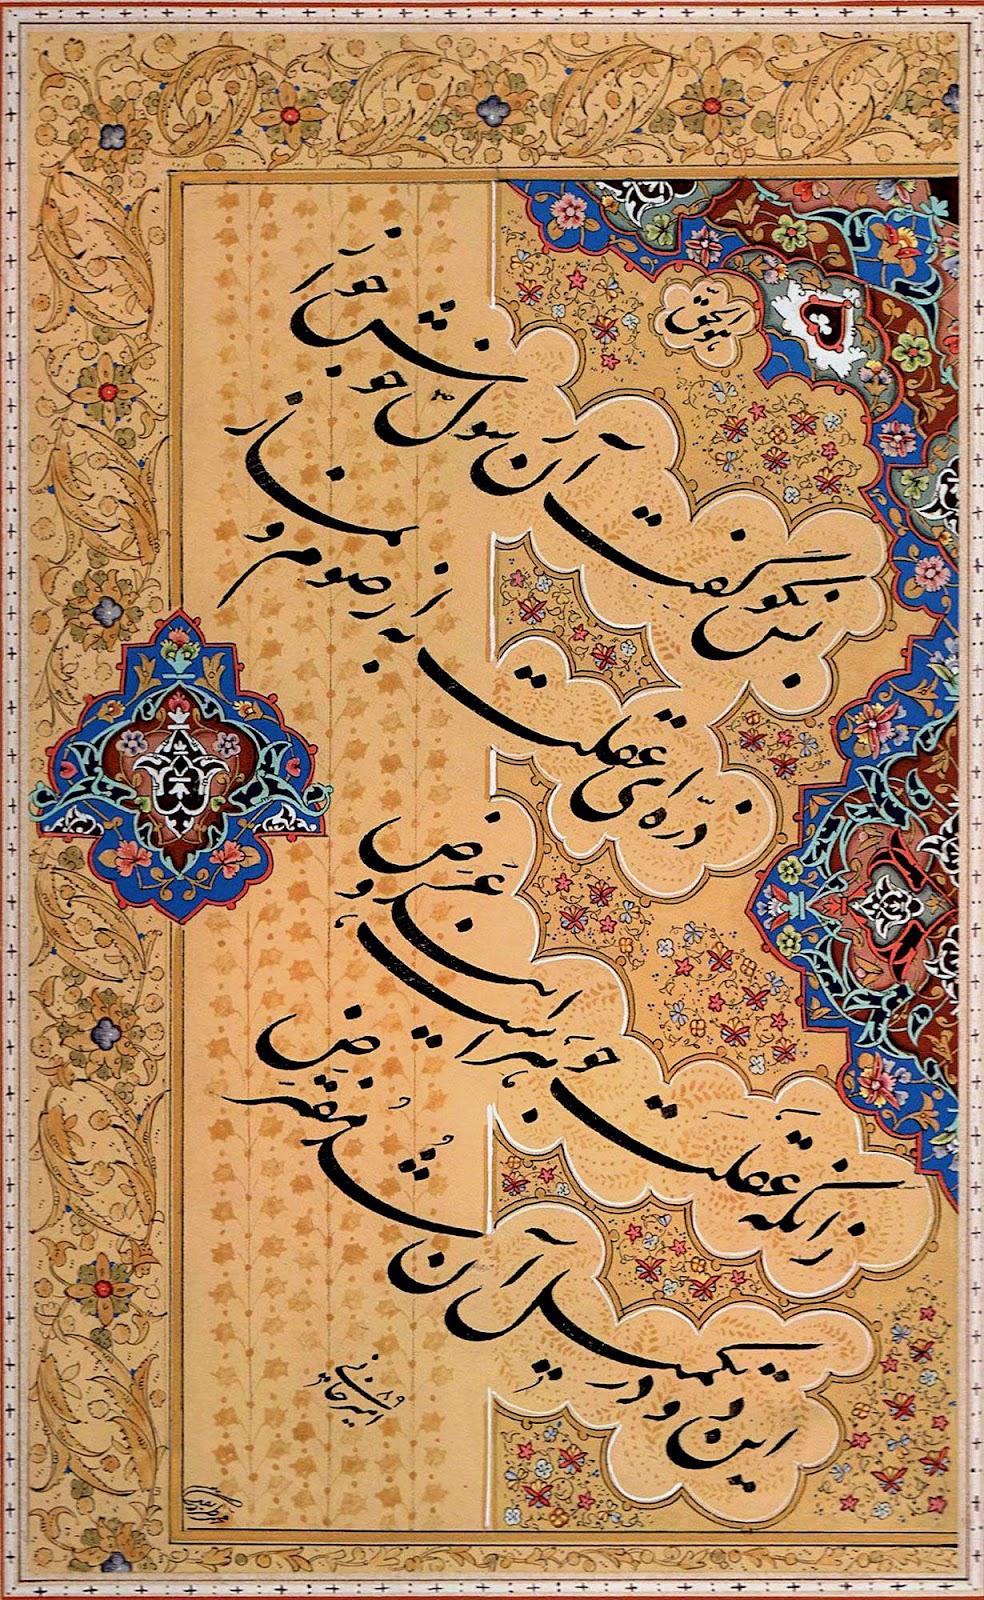 Arabic Persian Calligraphic Art And Paintings Al Mumtaz